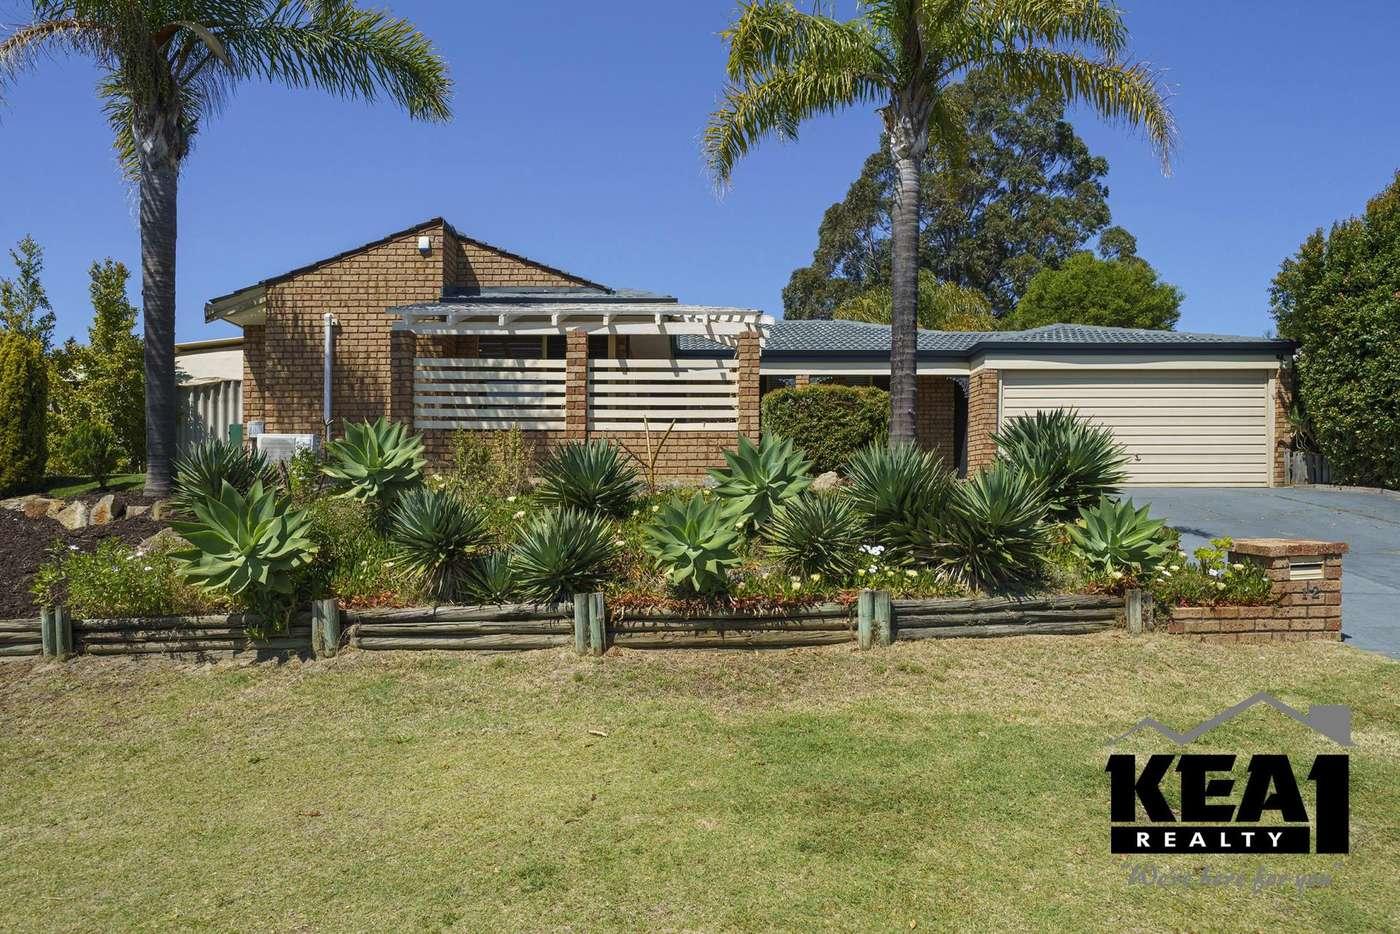 Main view of Homely house listing, 12 Evergreen Ramble, Ballajura WA 6066